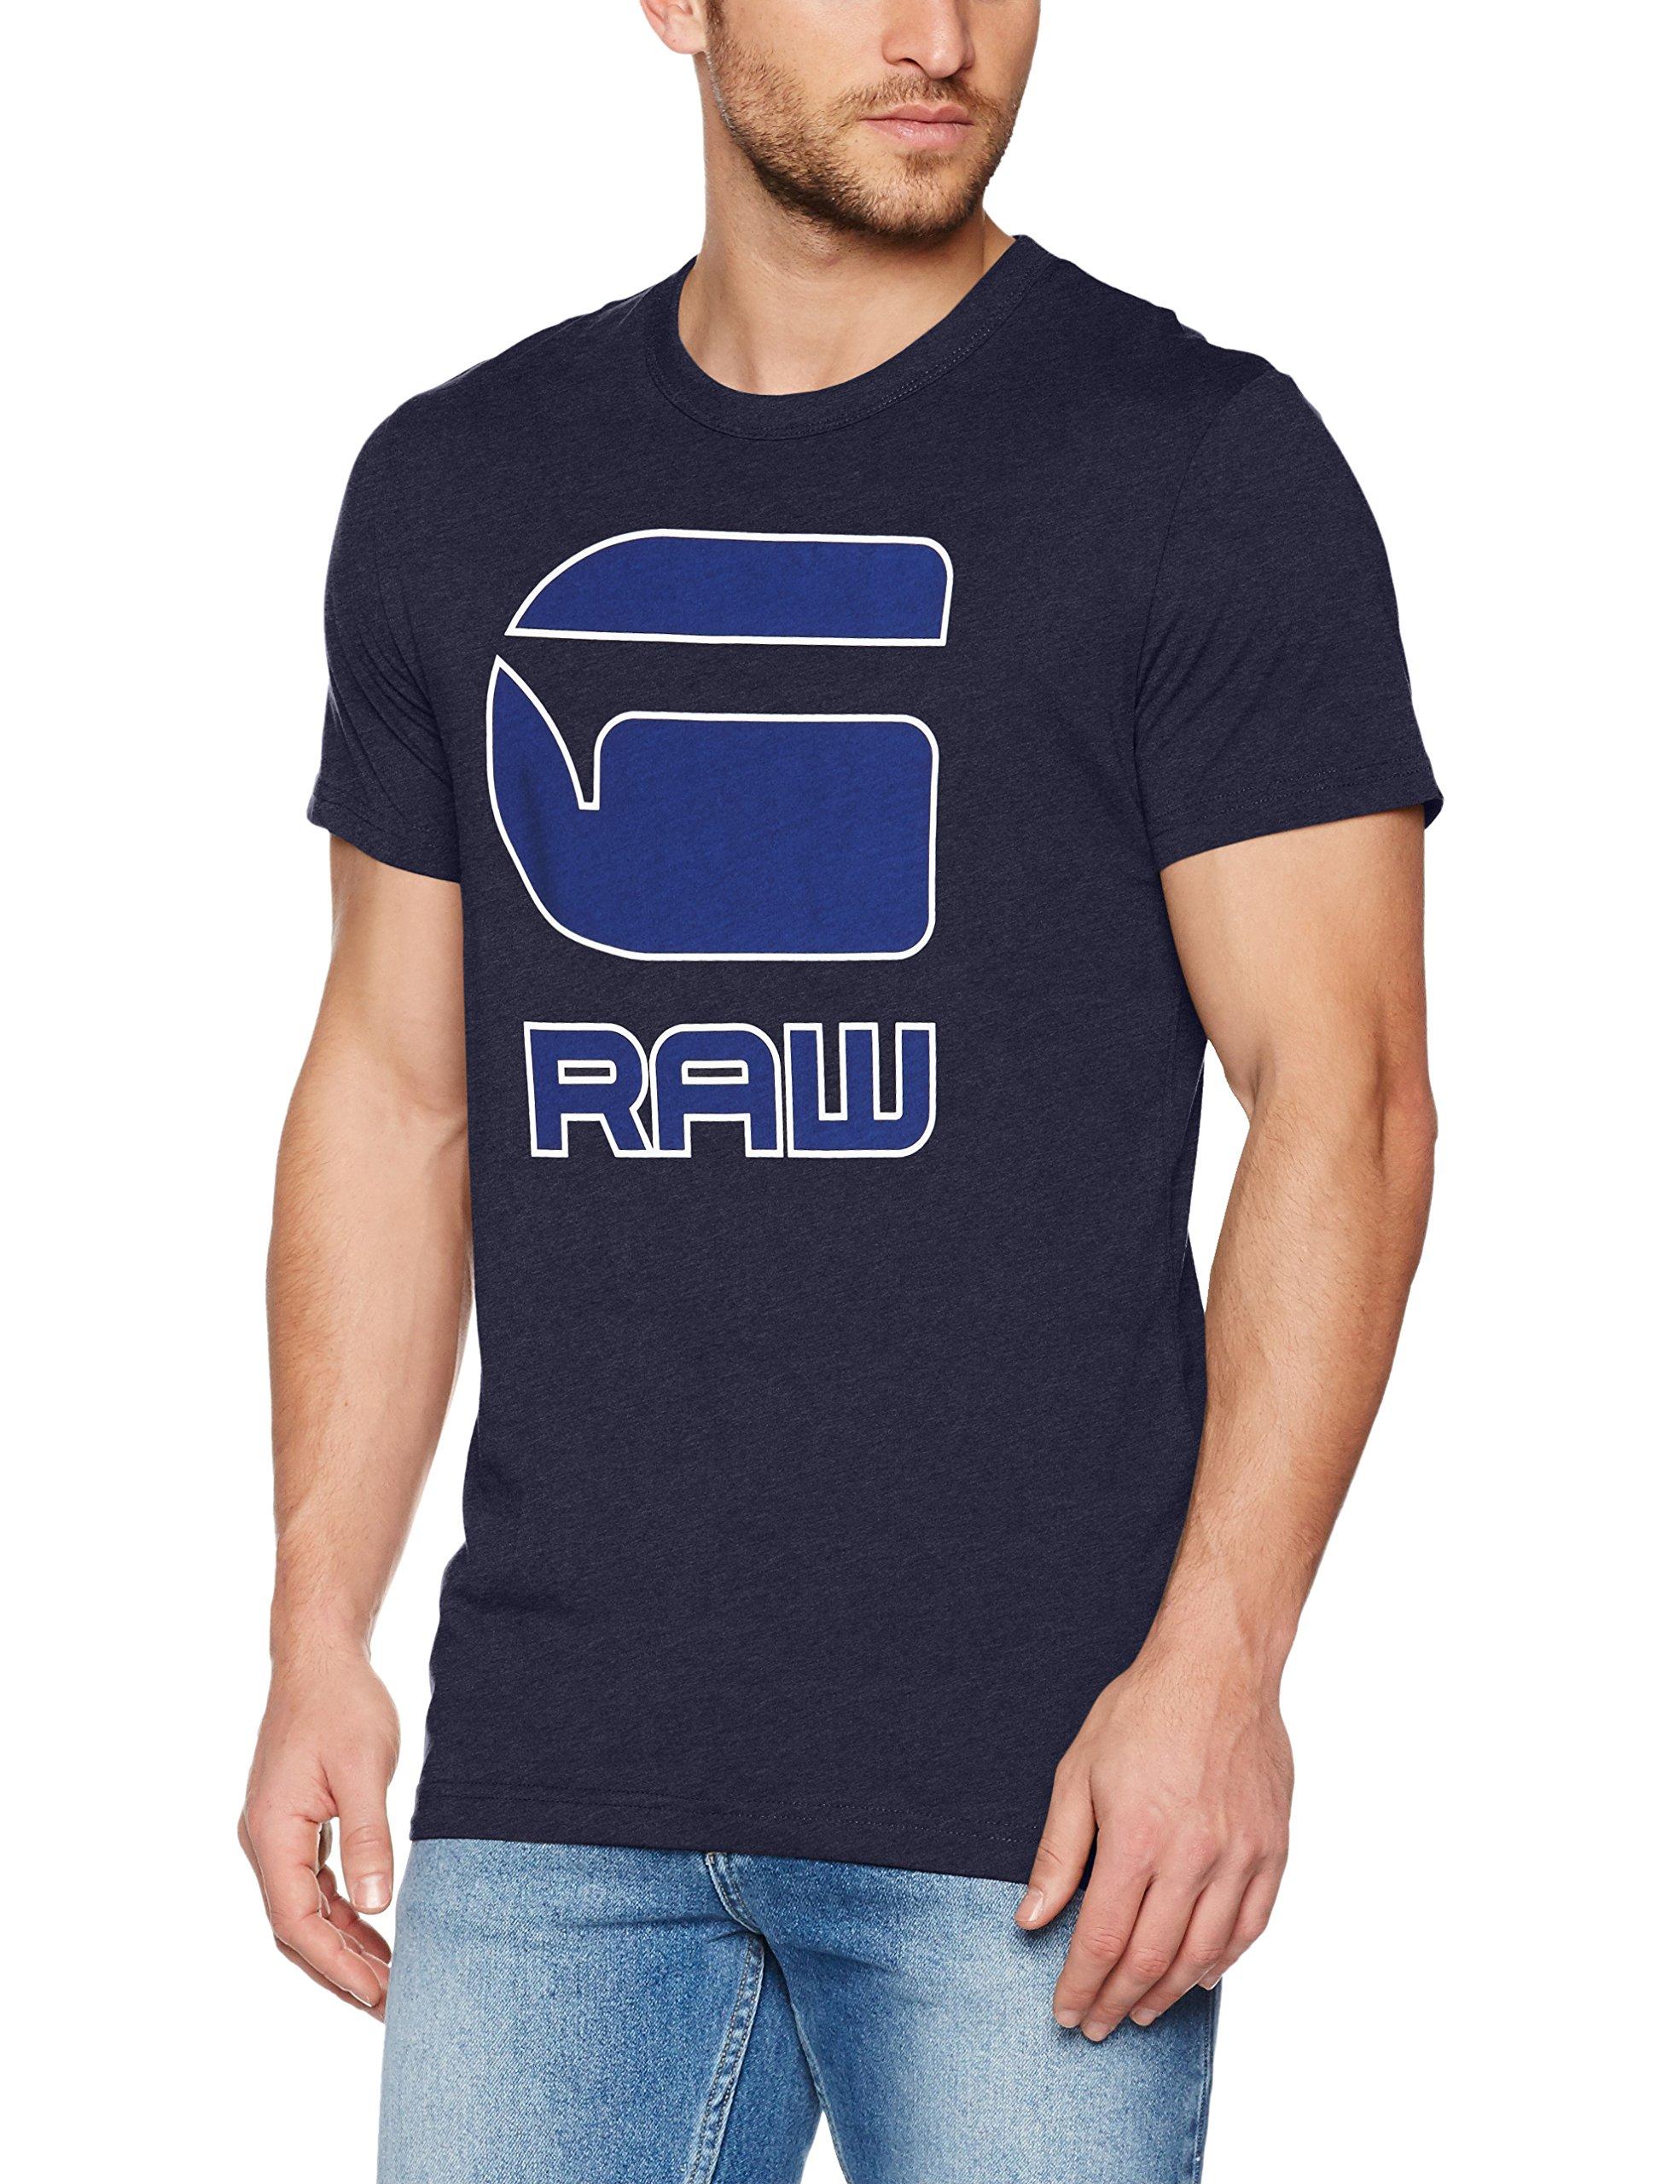 G-Star Raw Men's Cadulor r t s/s, Sartho Blue HTR, XS/1